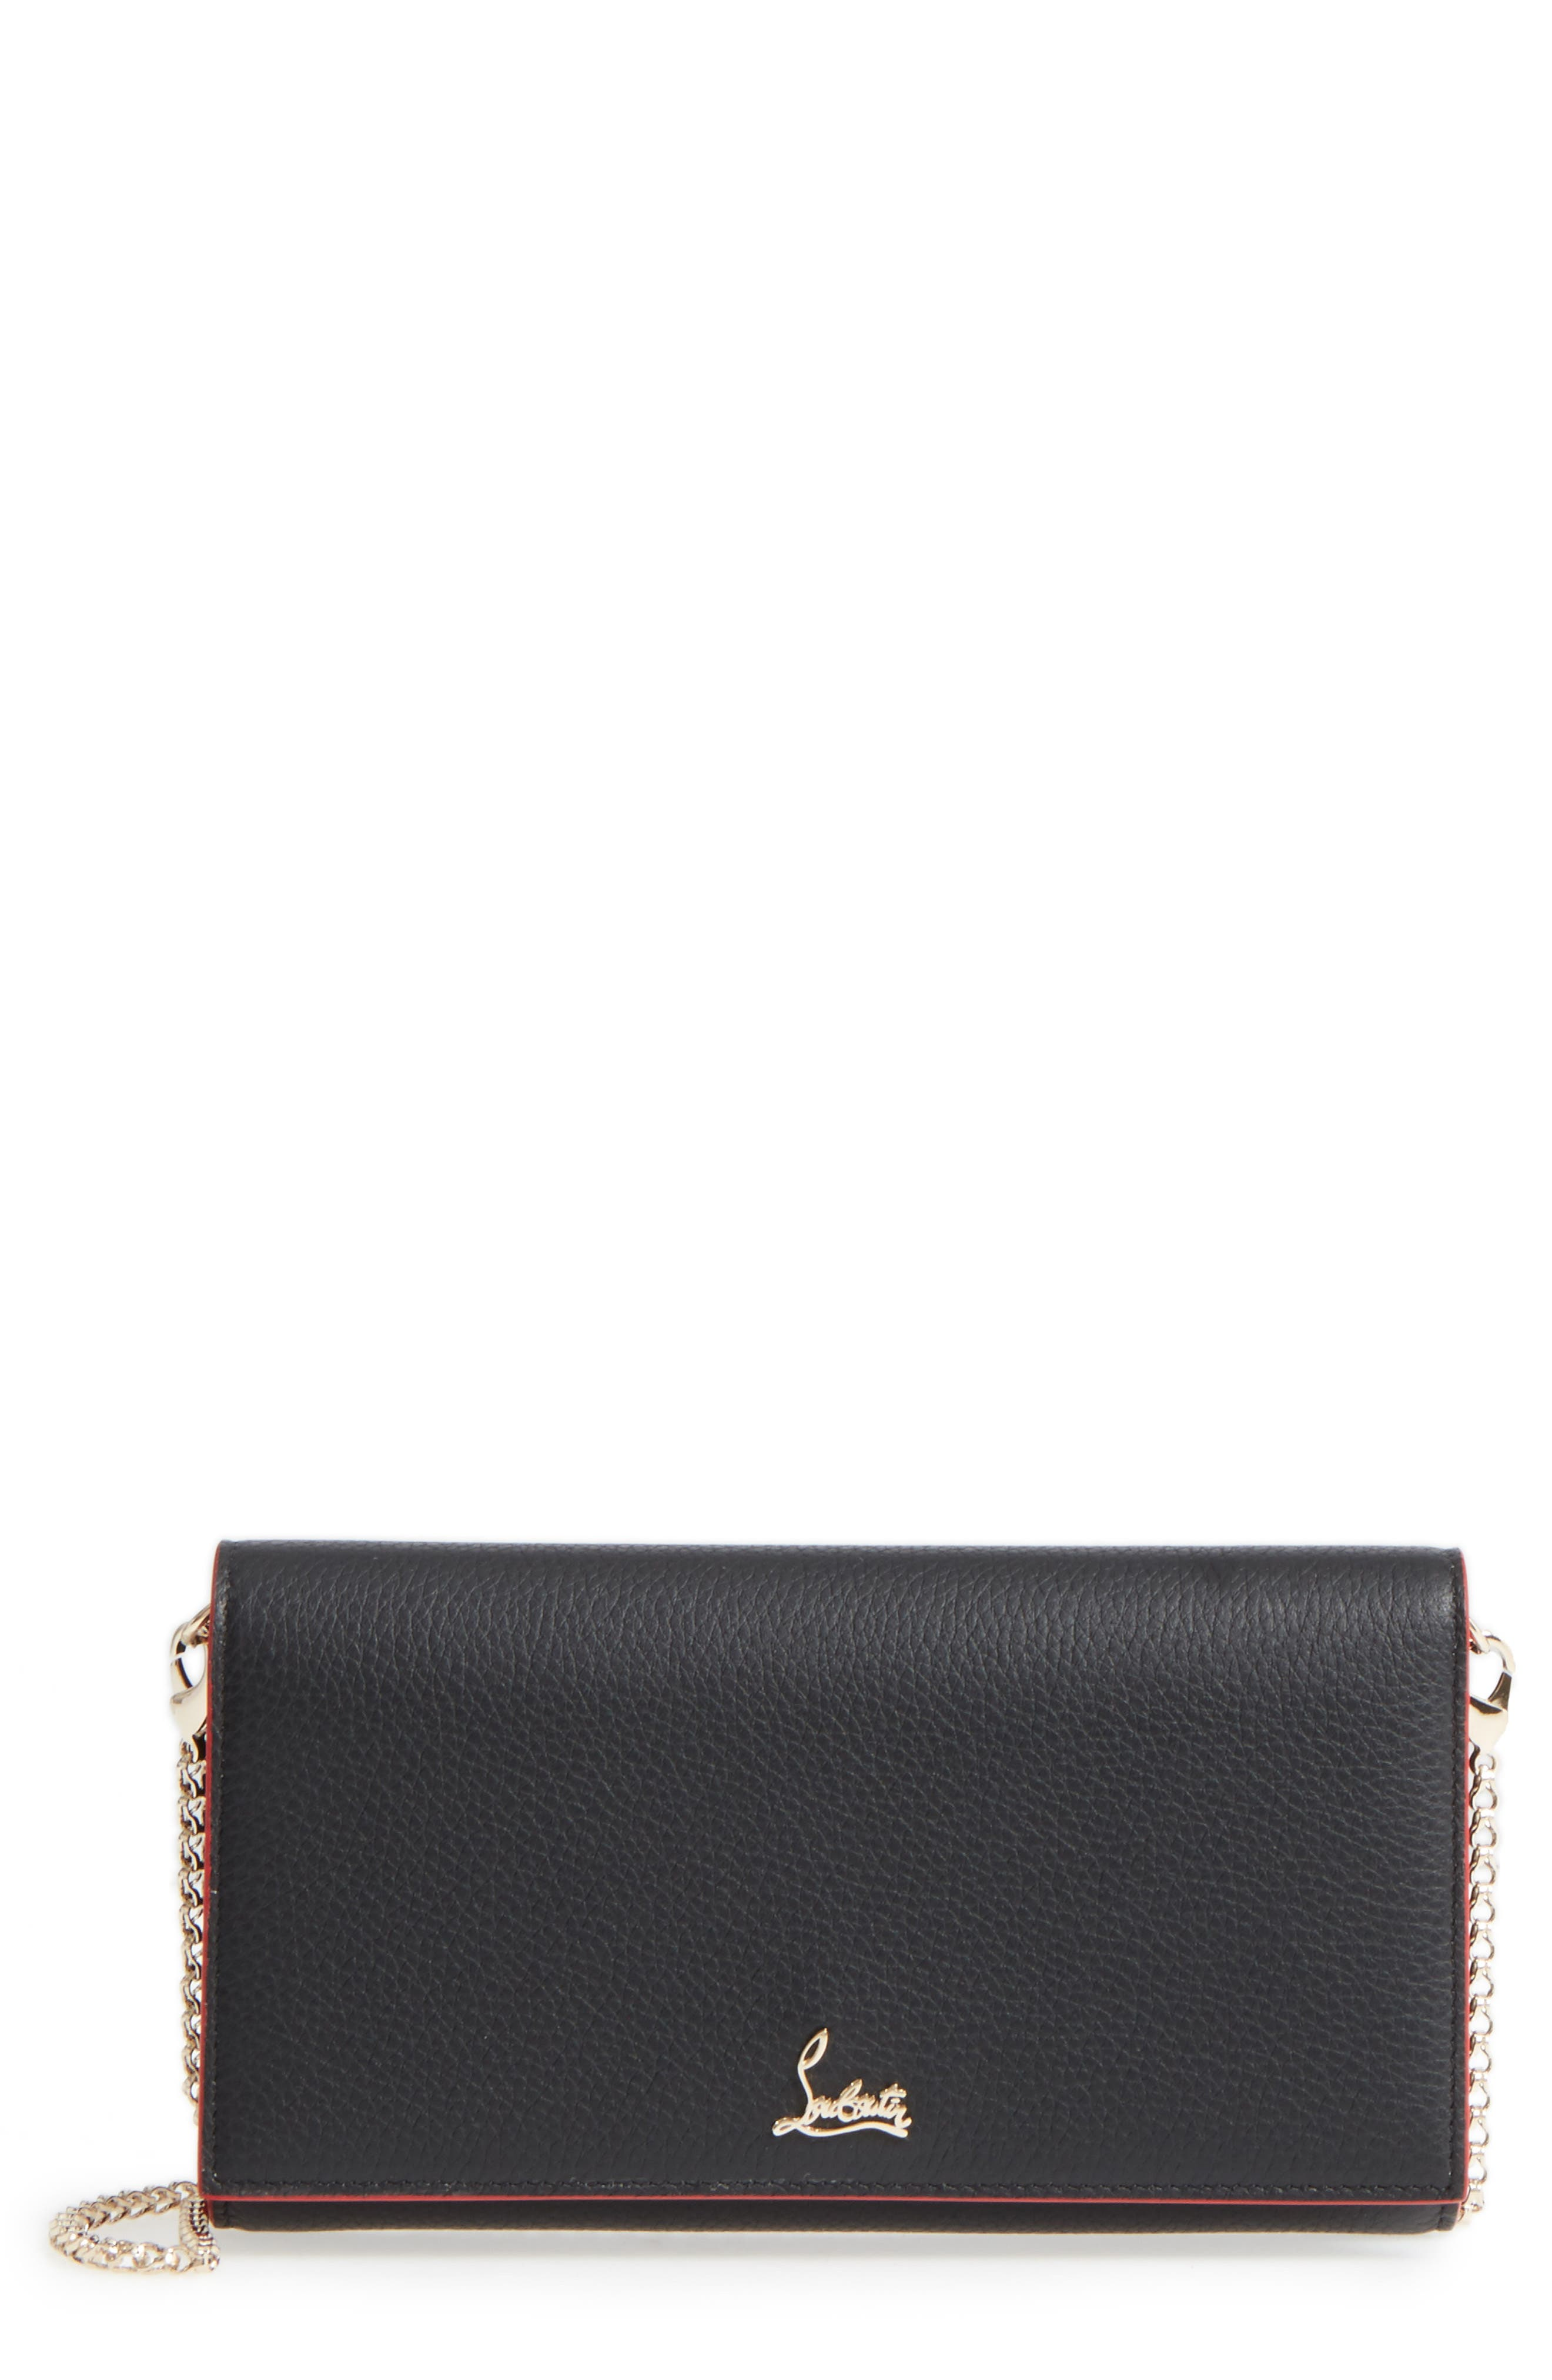 CHRISTIAN LOUBOUTIN, Boudoir Calfskin Leather Wallet, Main thumbnail 1, color, 012